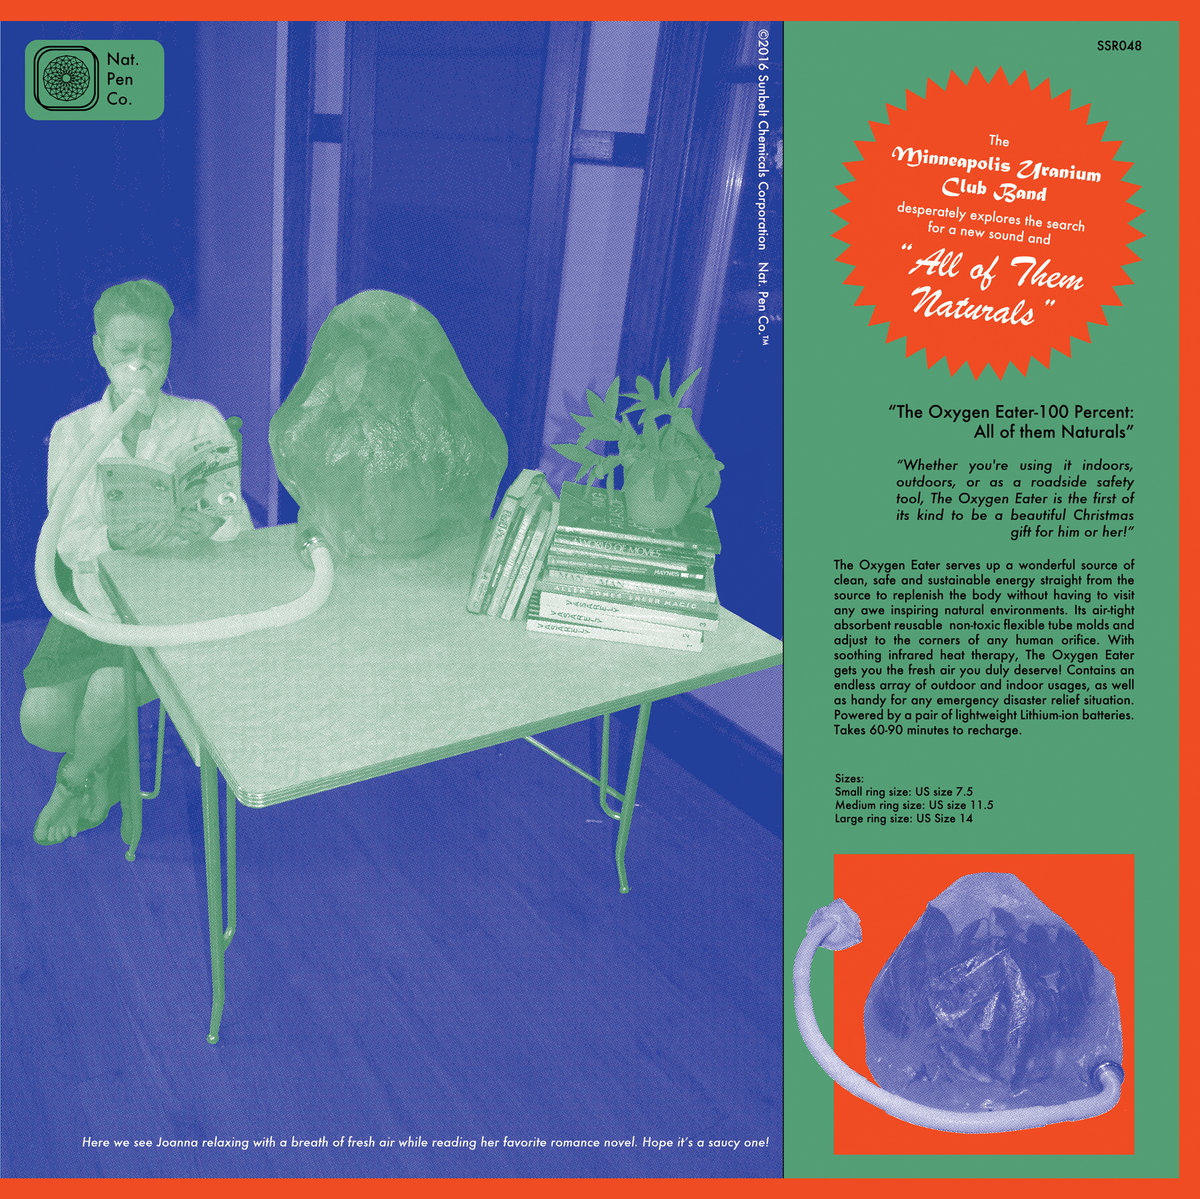 THE MINNEAPOLIS URANIUM CLUB All Of Them Naturals – Vinyl LP (green)